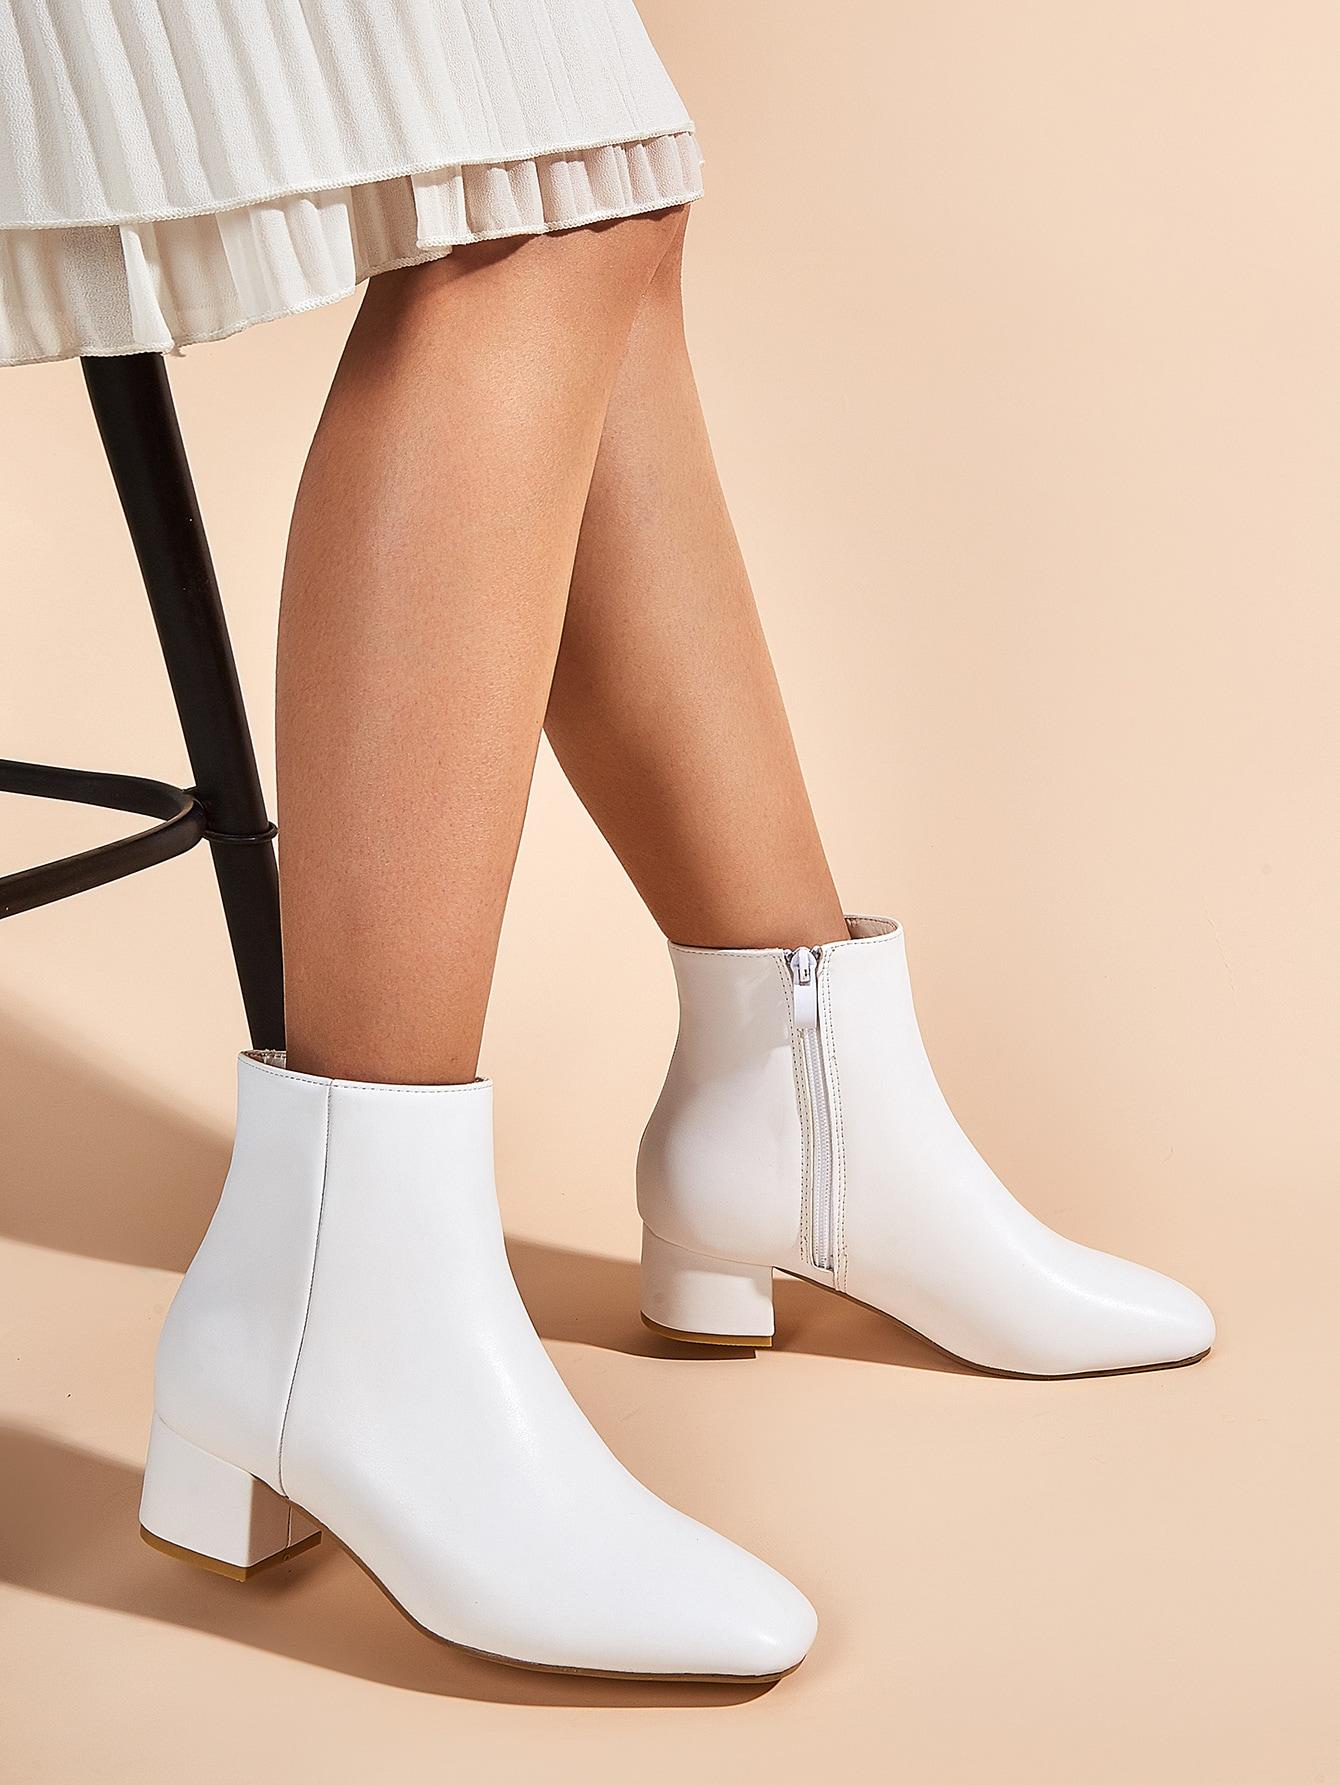 Square Toe Minimalist Chunky Heeled Boots